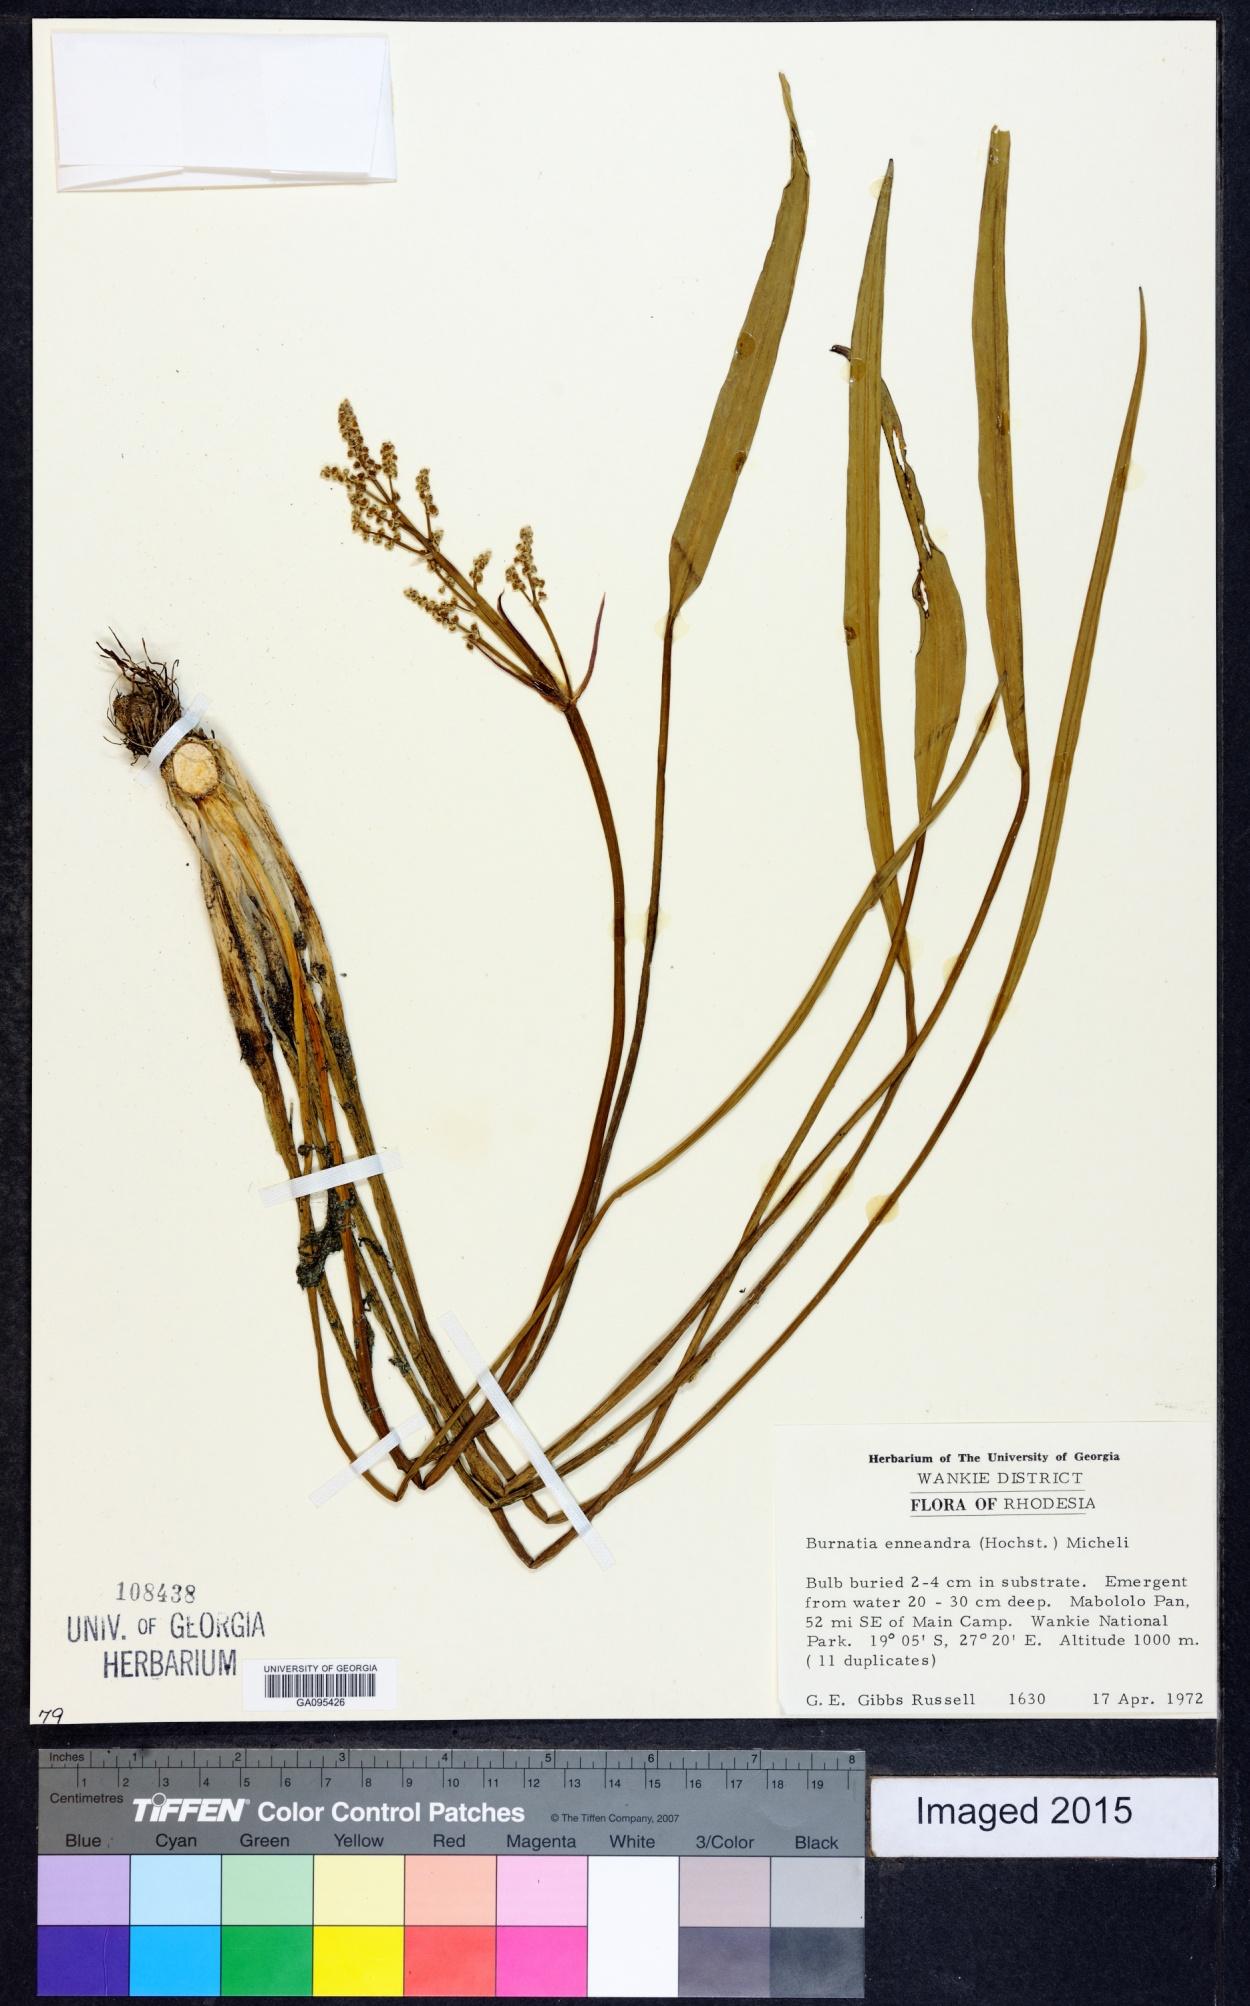 Burnatia enneandra image